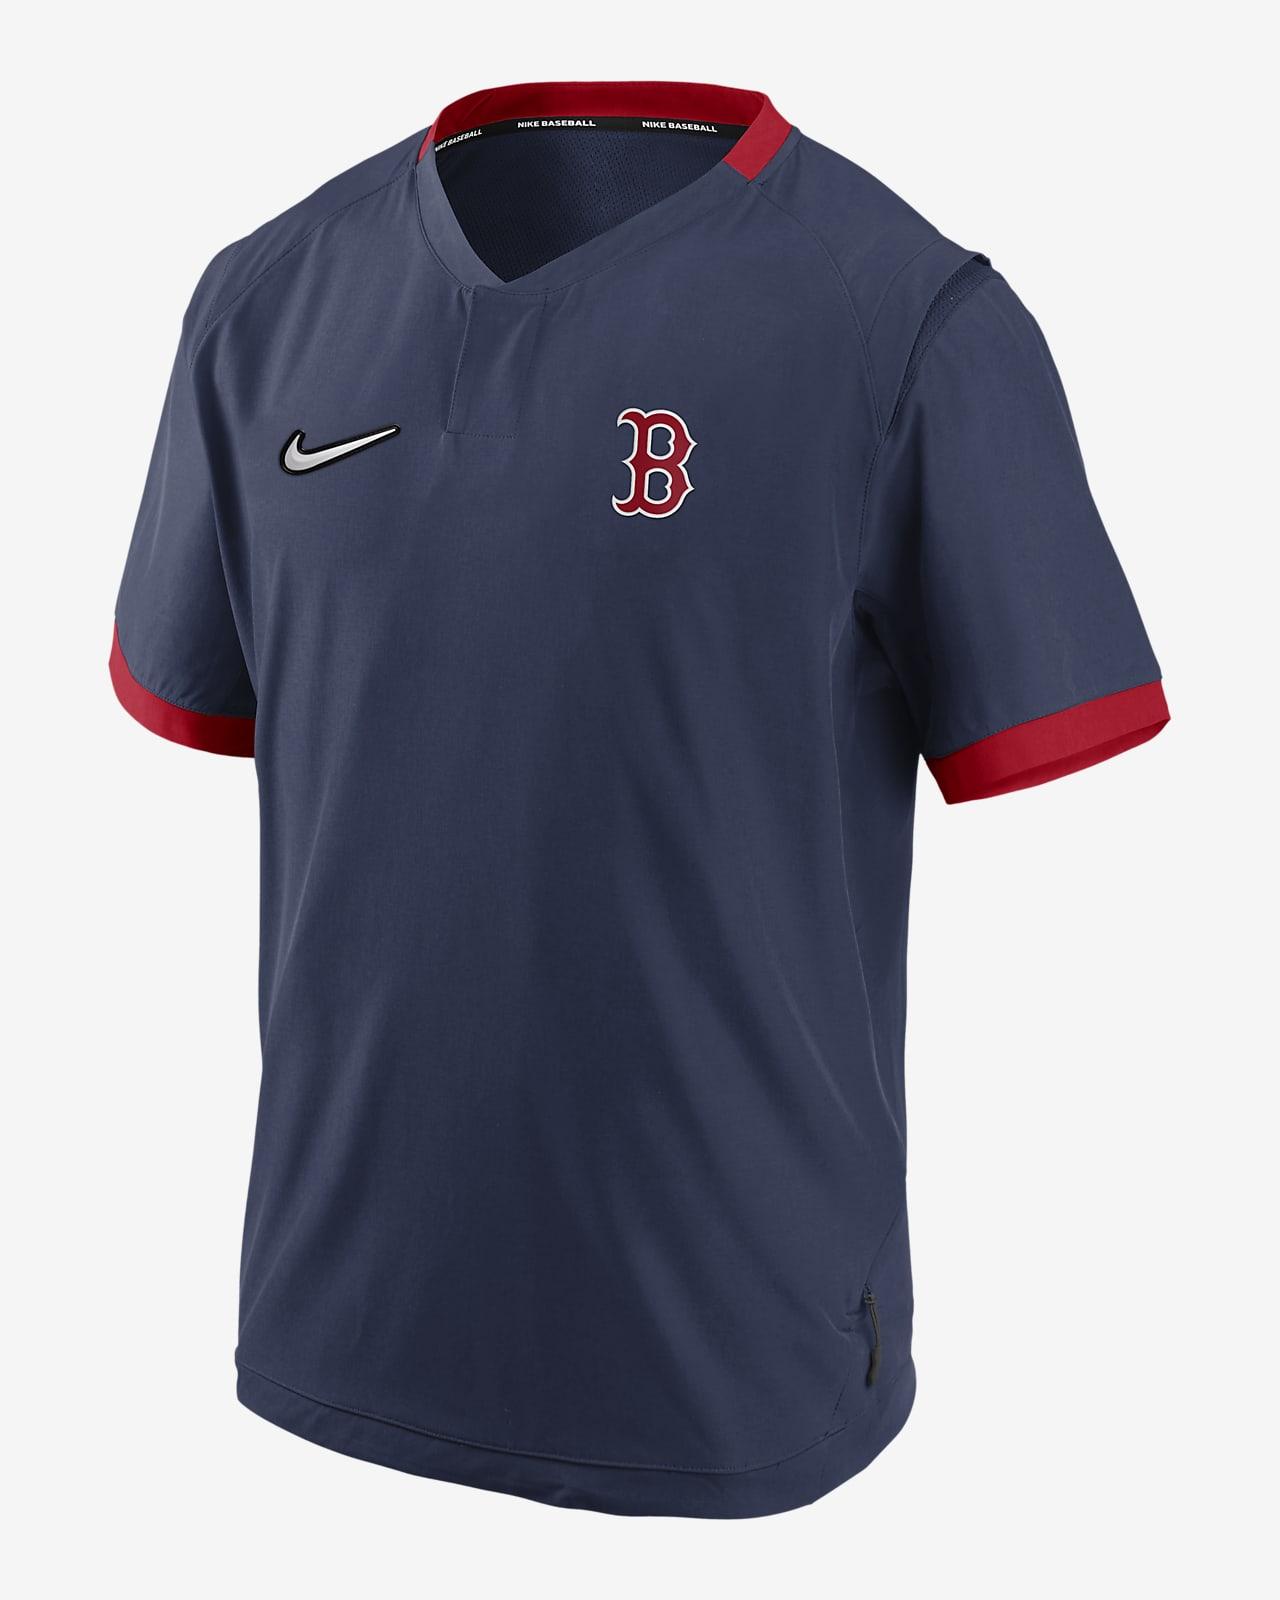 Chamarra de manga corta para hombre Nike Hot (MLB Boston Red Sox)